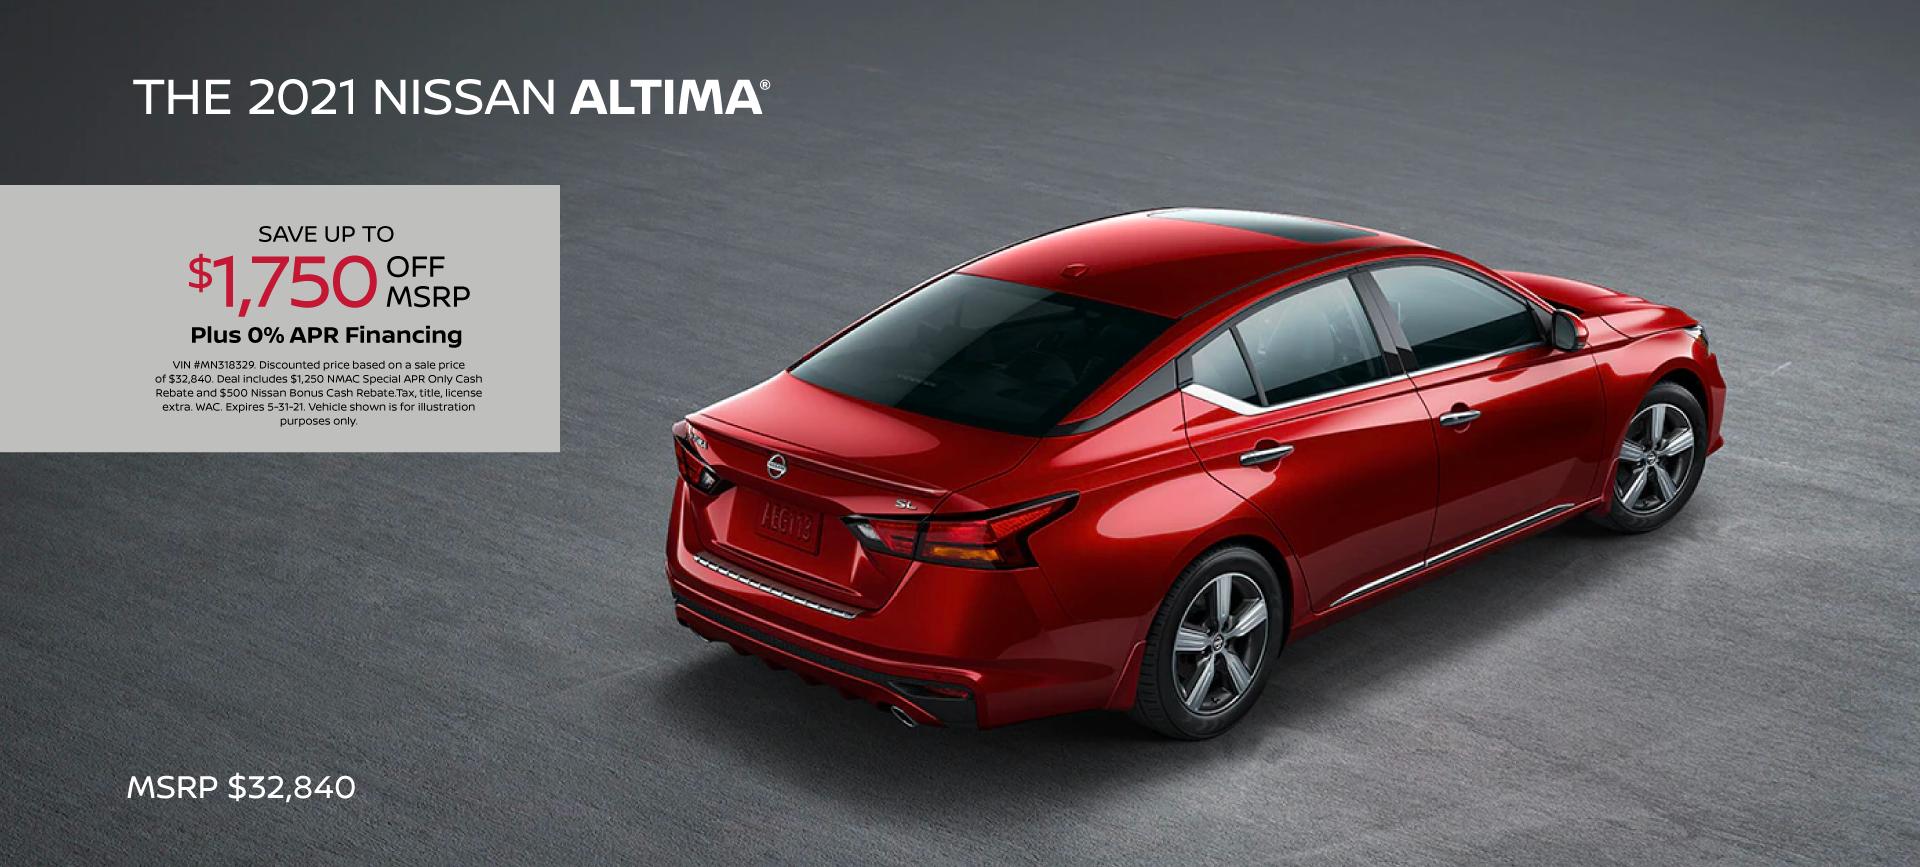 Nissan-Bellevue-OEM-0621_Altima